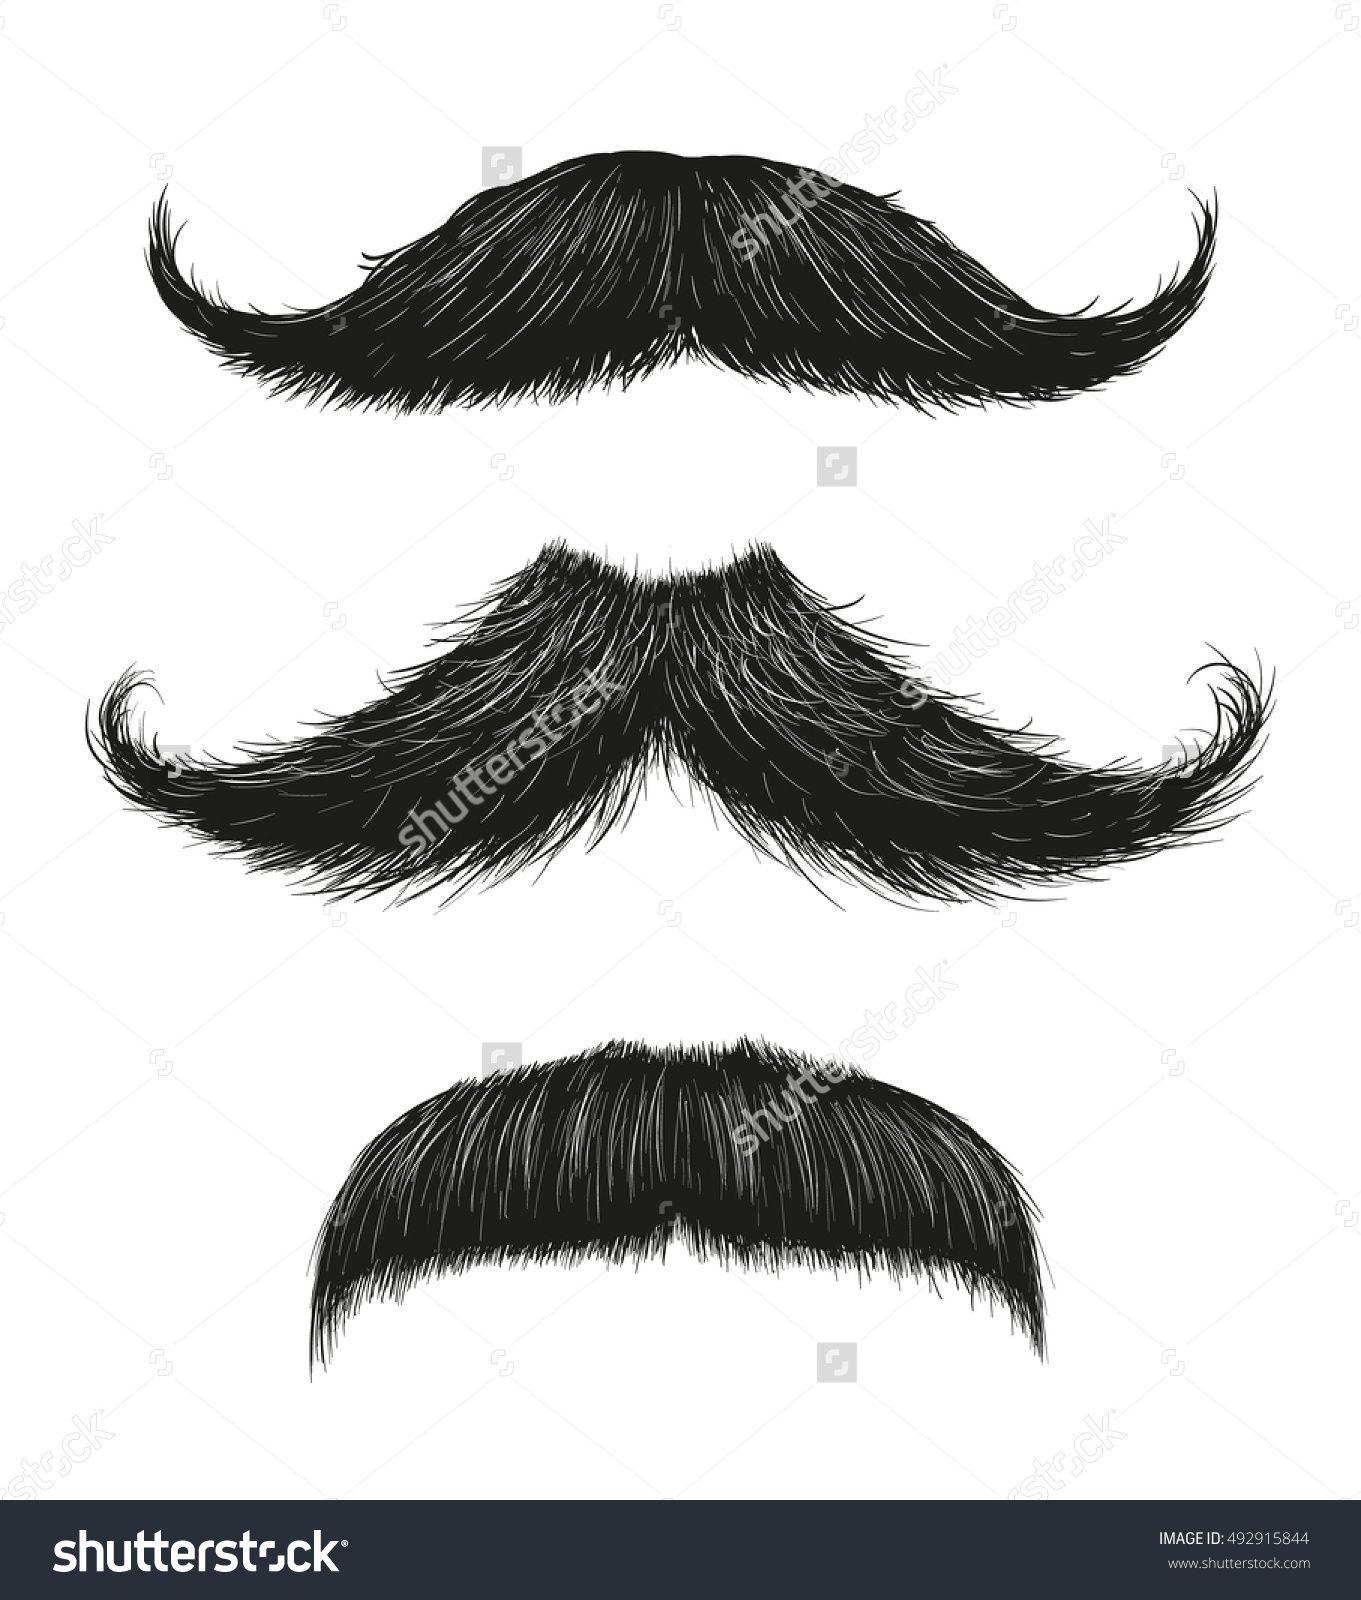 Three Hand Drawn Vector Mustaches Fashionable Old Facial Hair